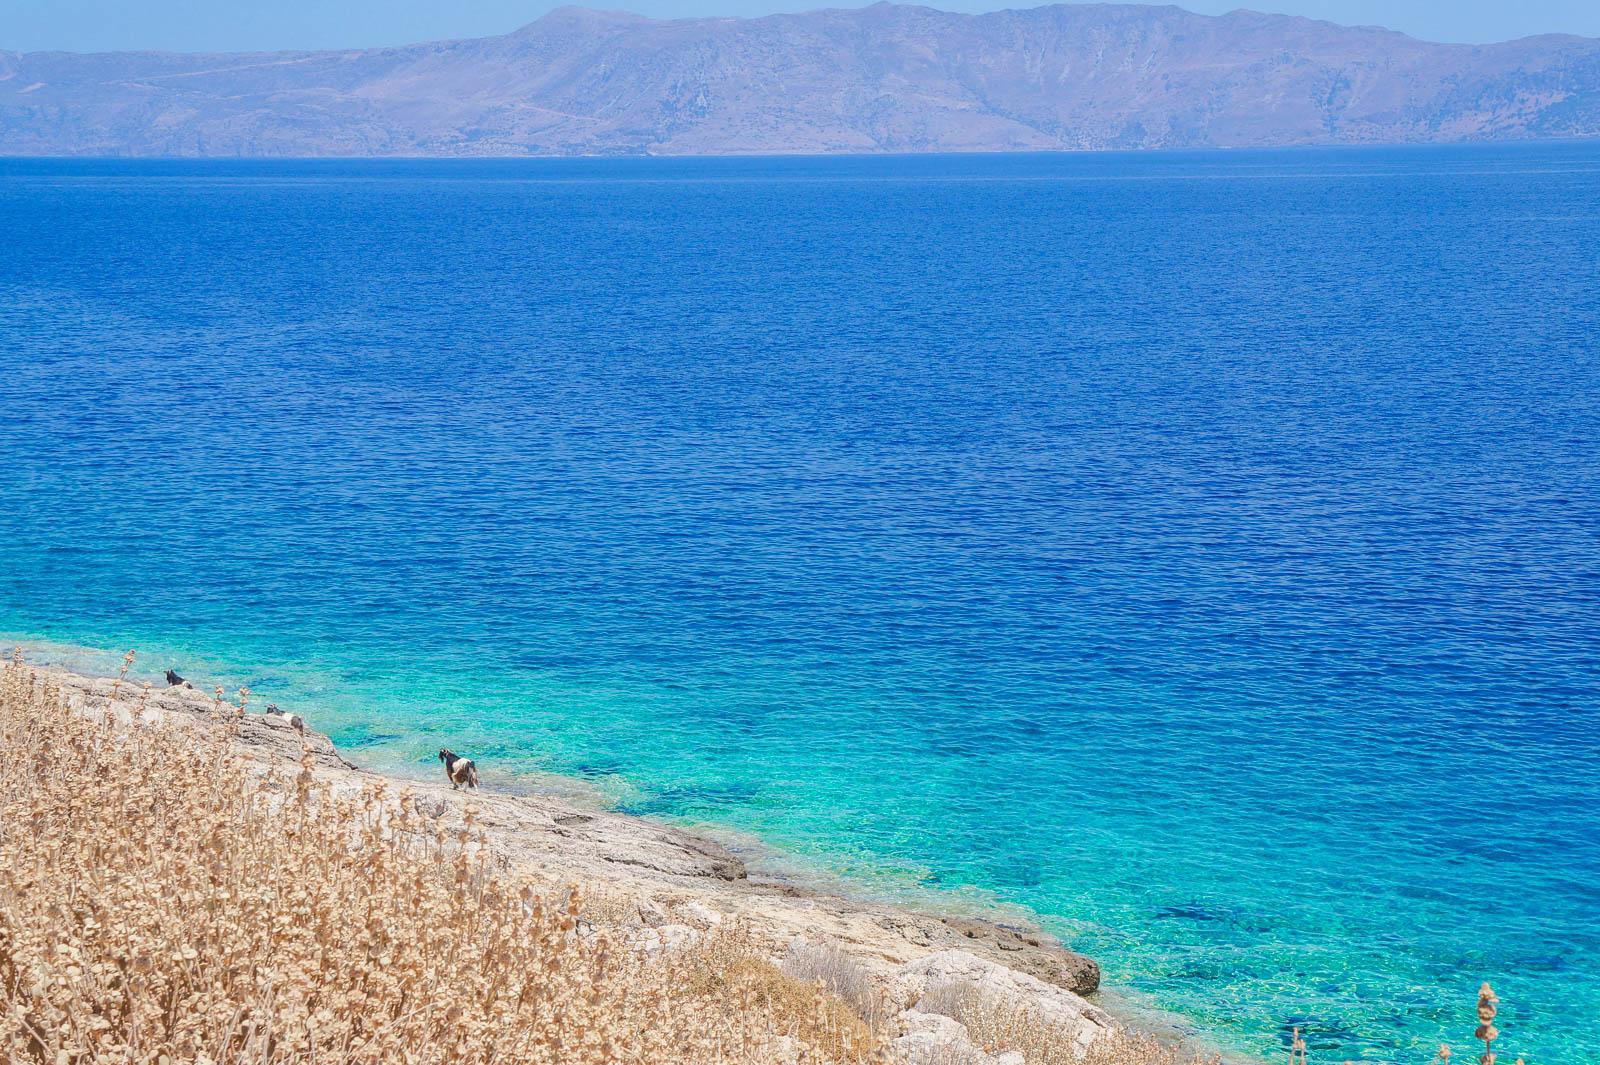 mpalos-beach-crete-greece-la-vie-en-blog-all-rights-reserved